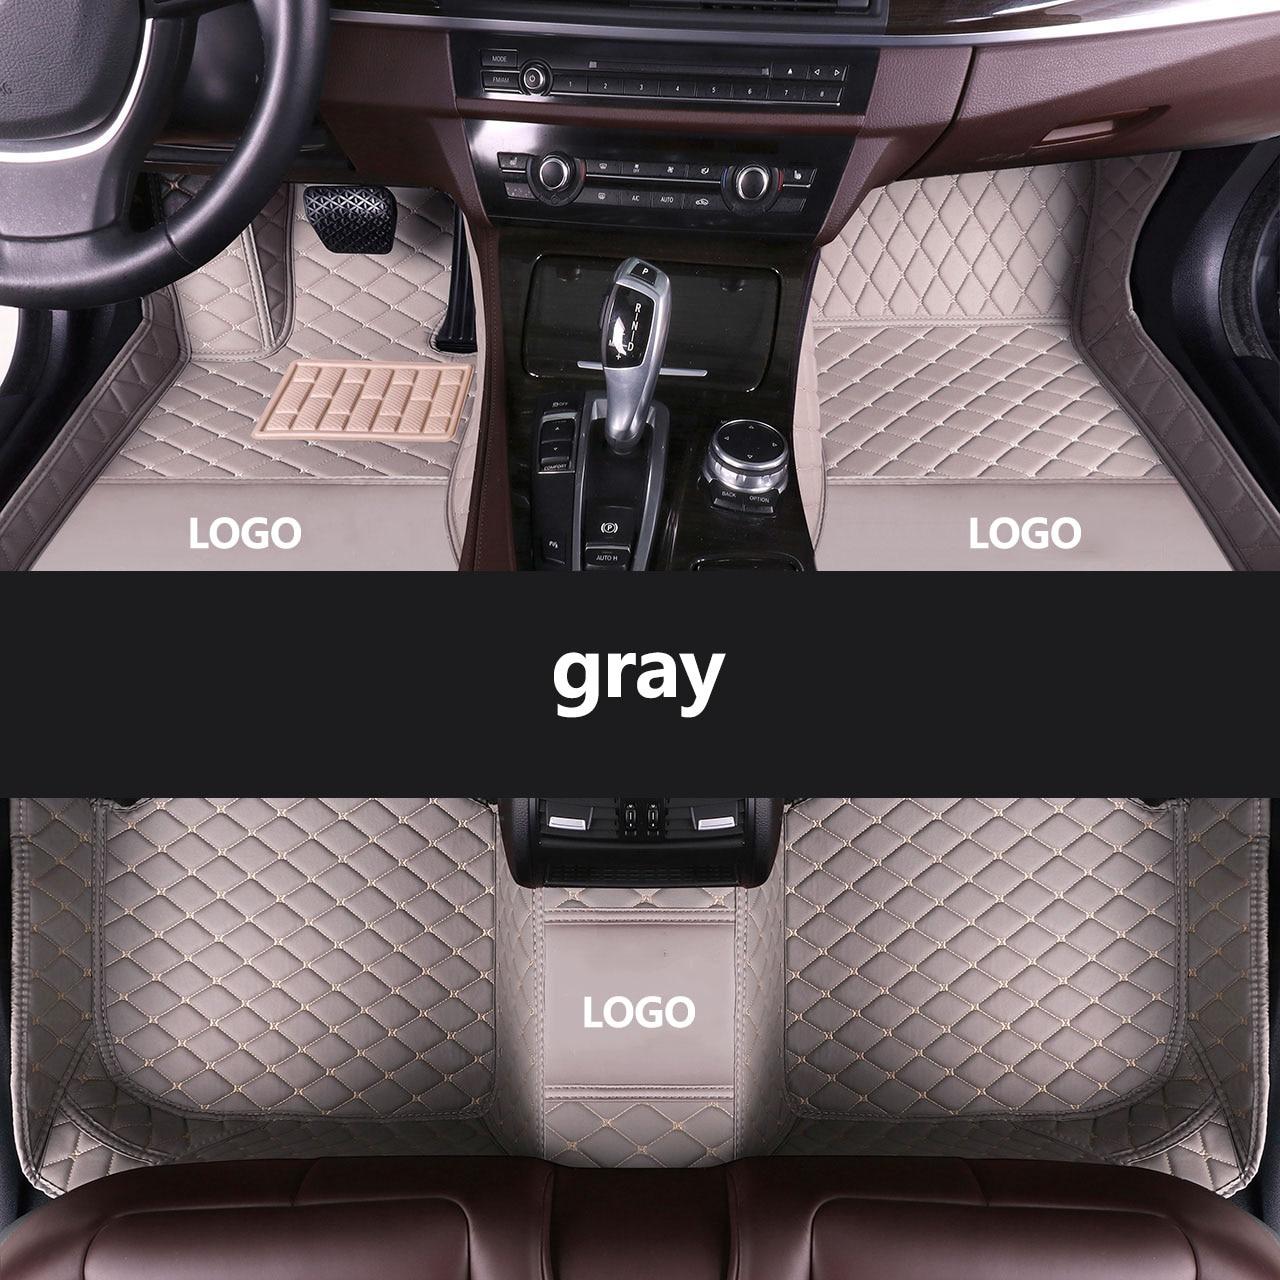 kalaisike Custom LOGO car floor mats for Peugeot All Model 4008 RCZ 301 3008 308 508 206 307 207 408 5008 2008 607 auto styling